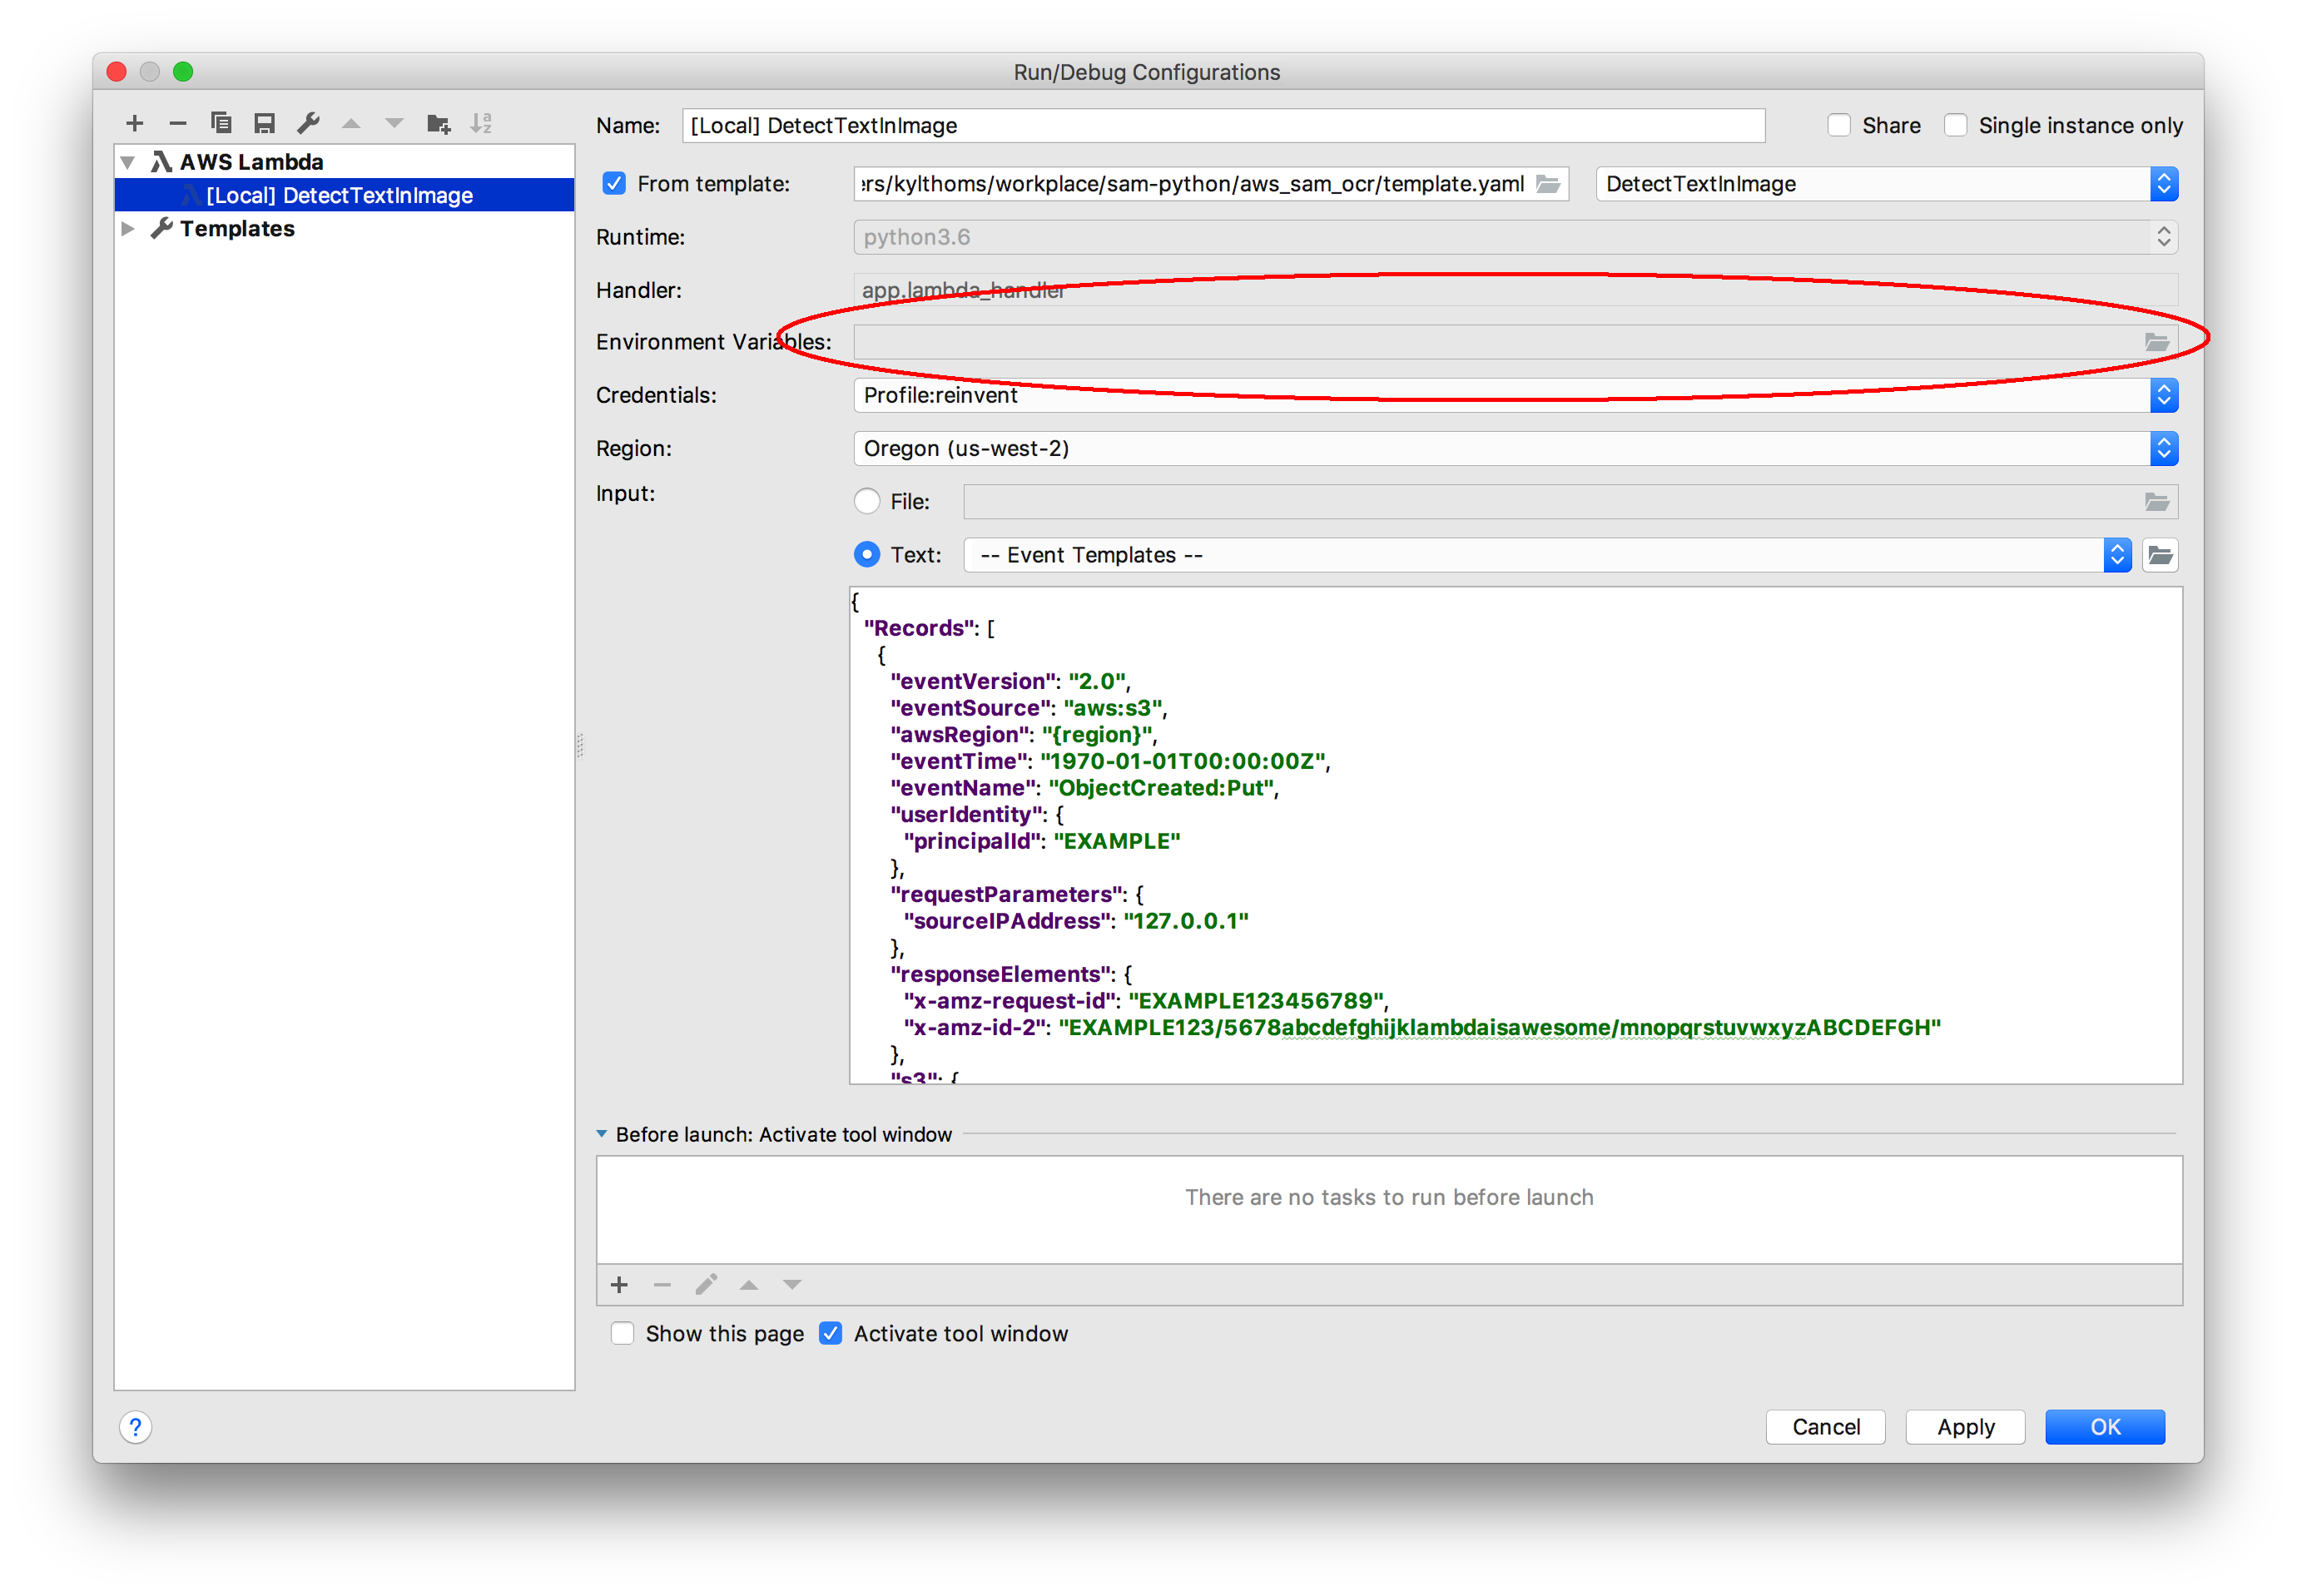 SAM Local Run Configuration environment variables